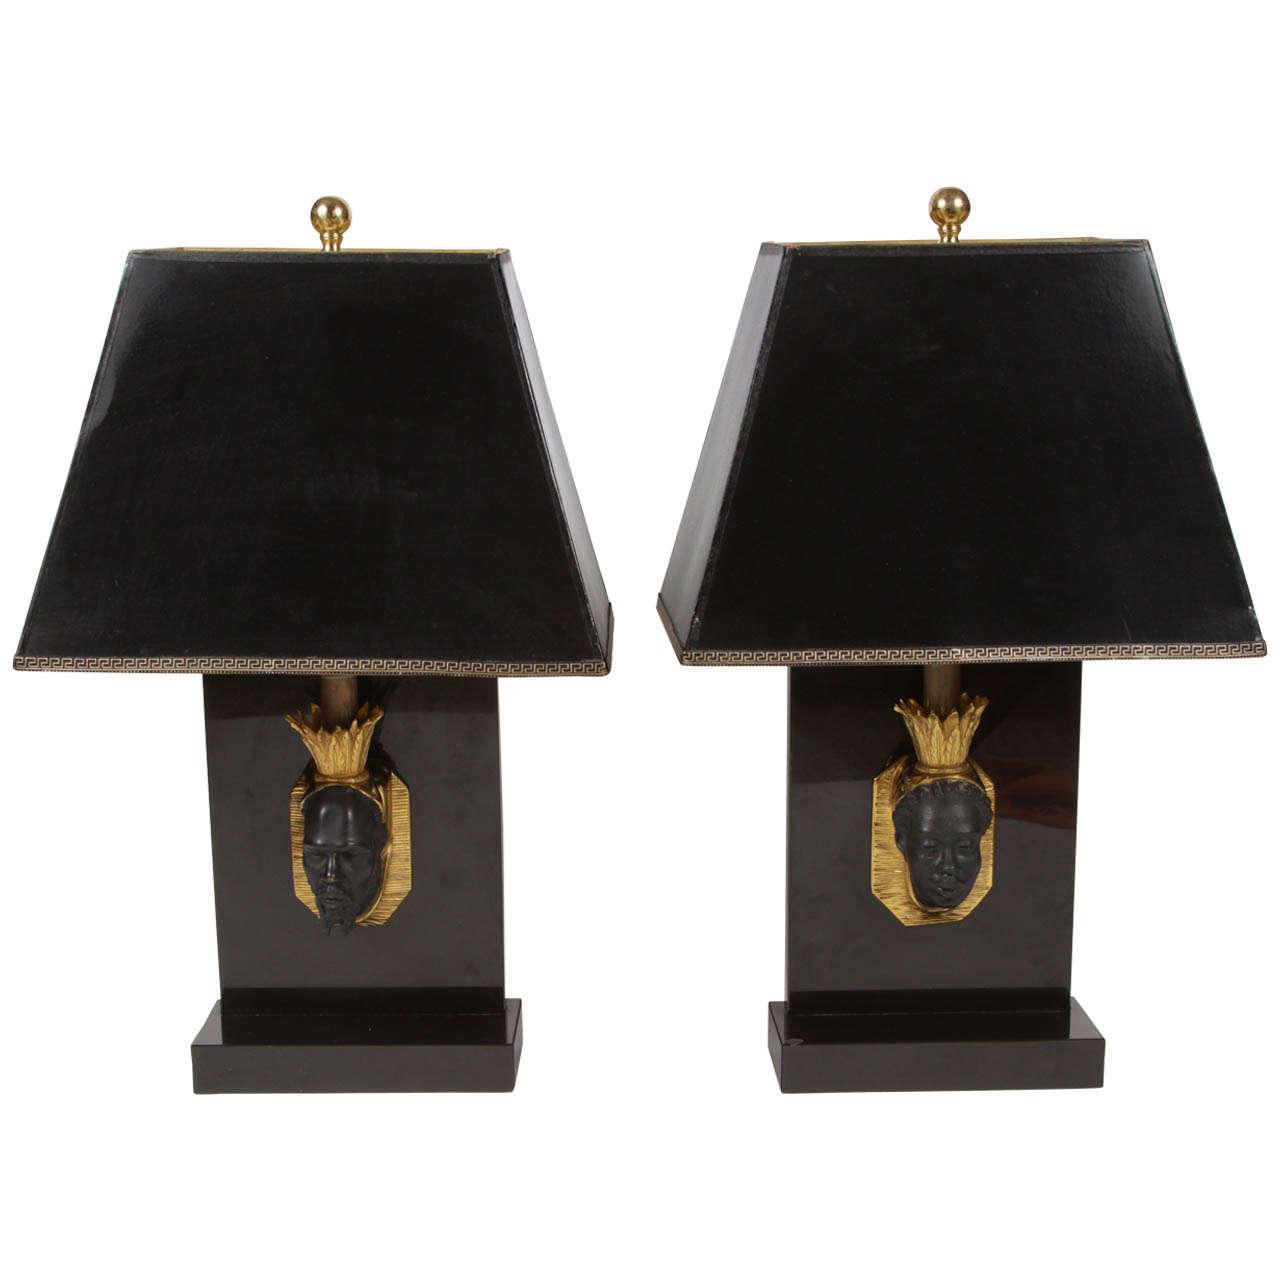 Pair of Maison Jansen Nubian Lamps